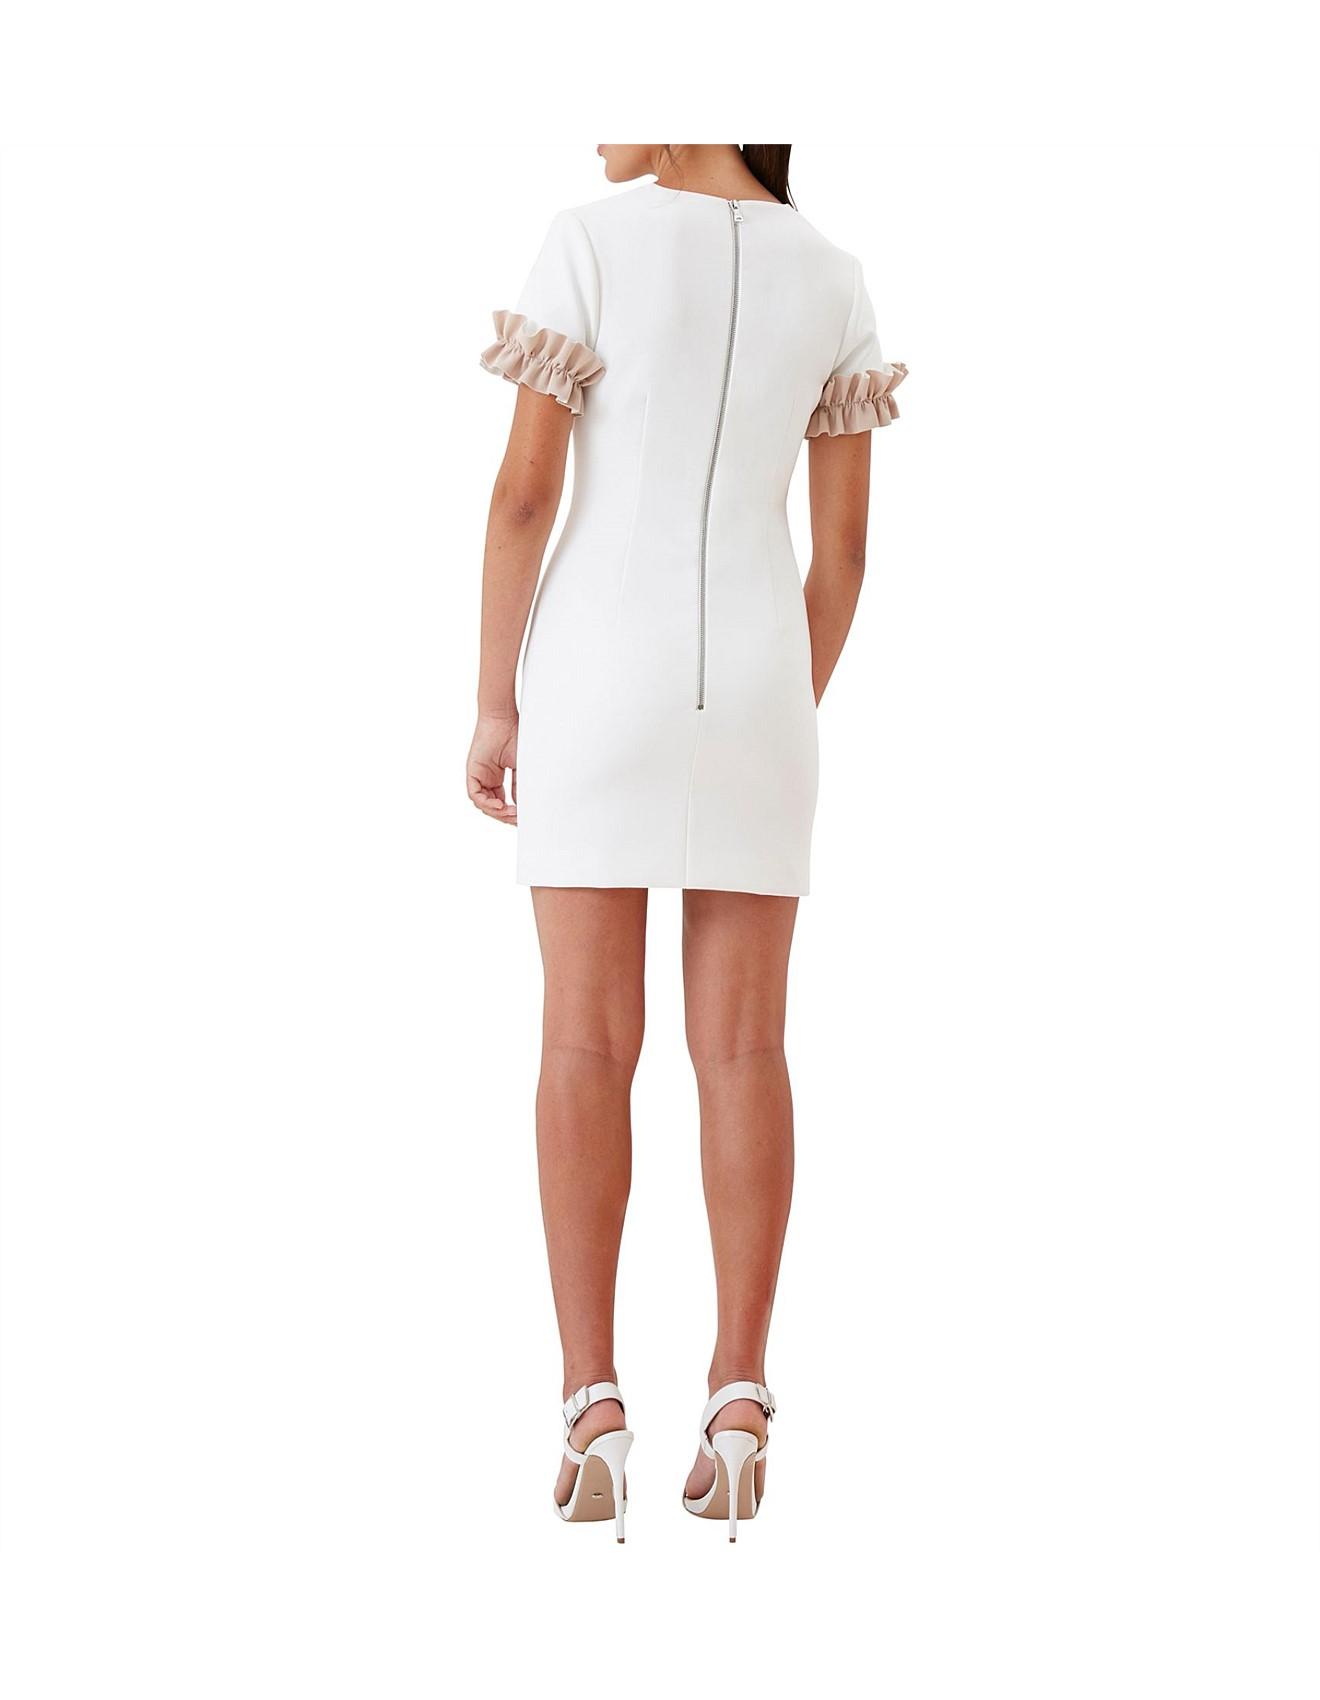 0264a0c990e6d Ruffle Sleeve Tee Mini Dress Special Offer. 1